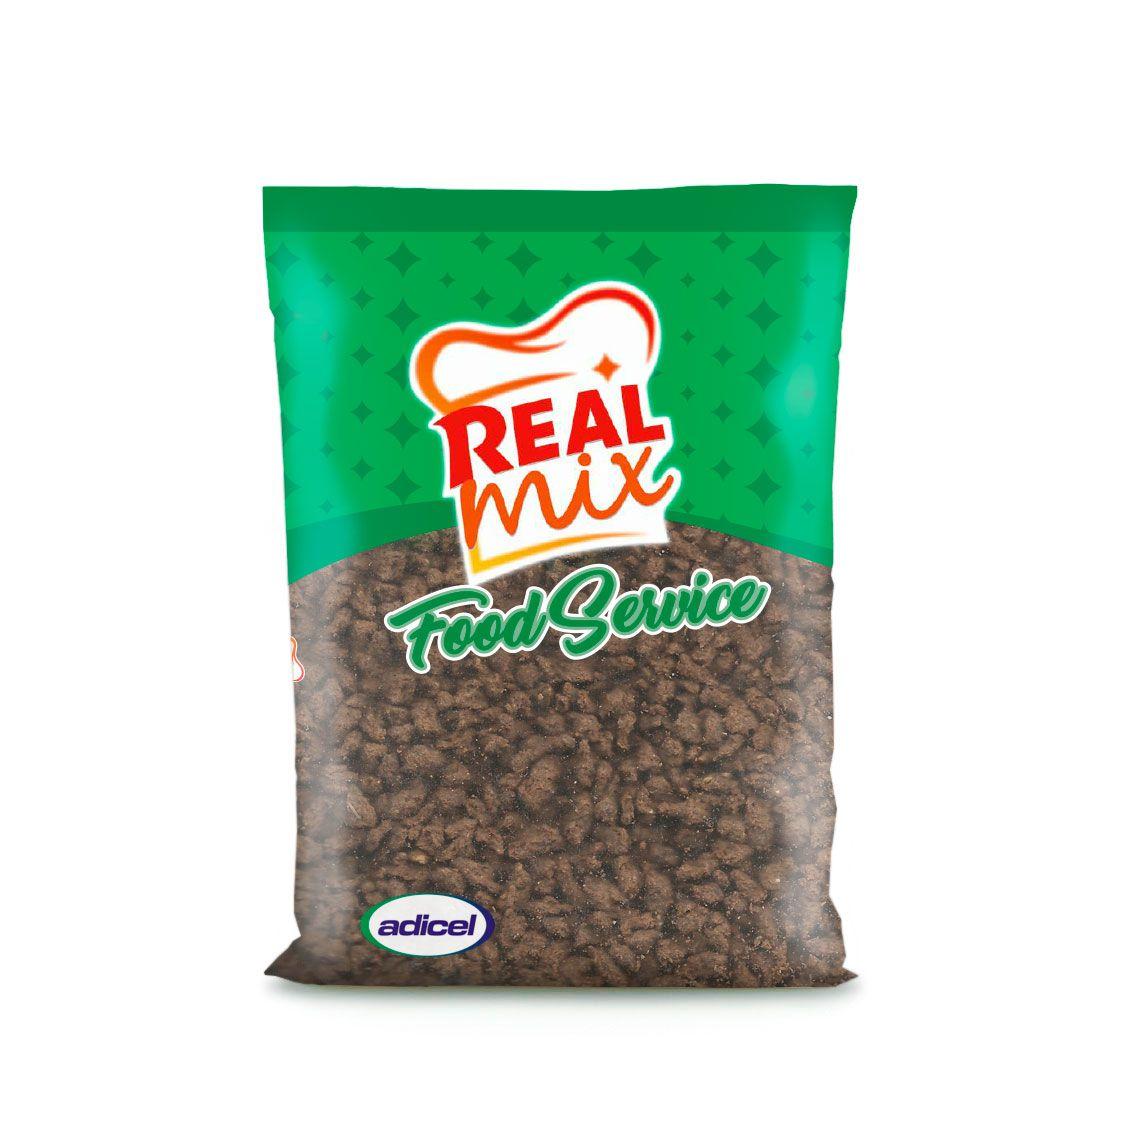 Proteína Texturizada  De Soja Cor Caramelo Tamanho Médio - 400 g